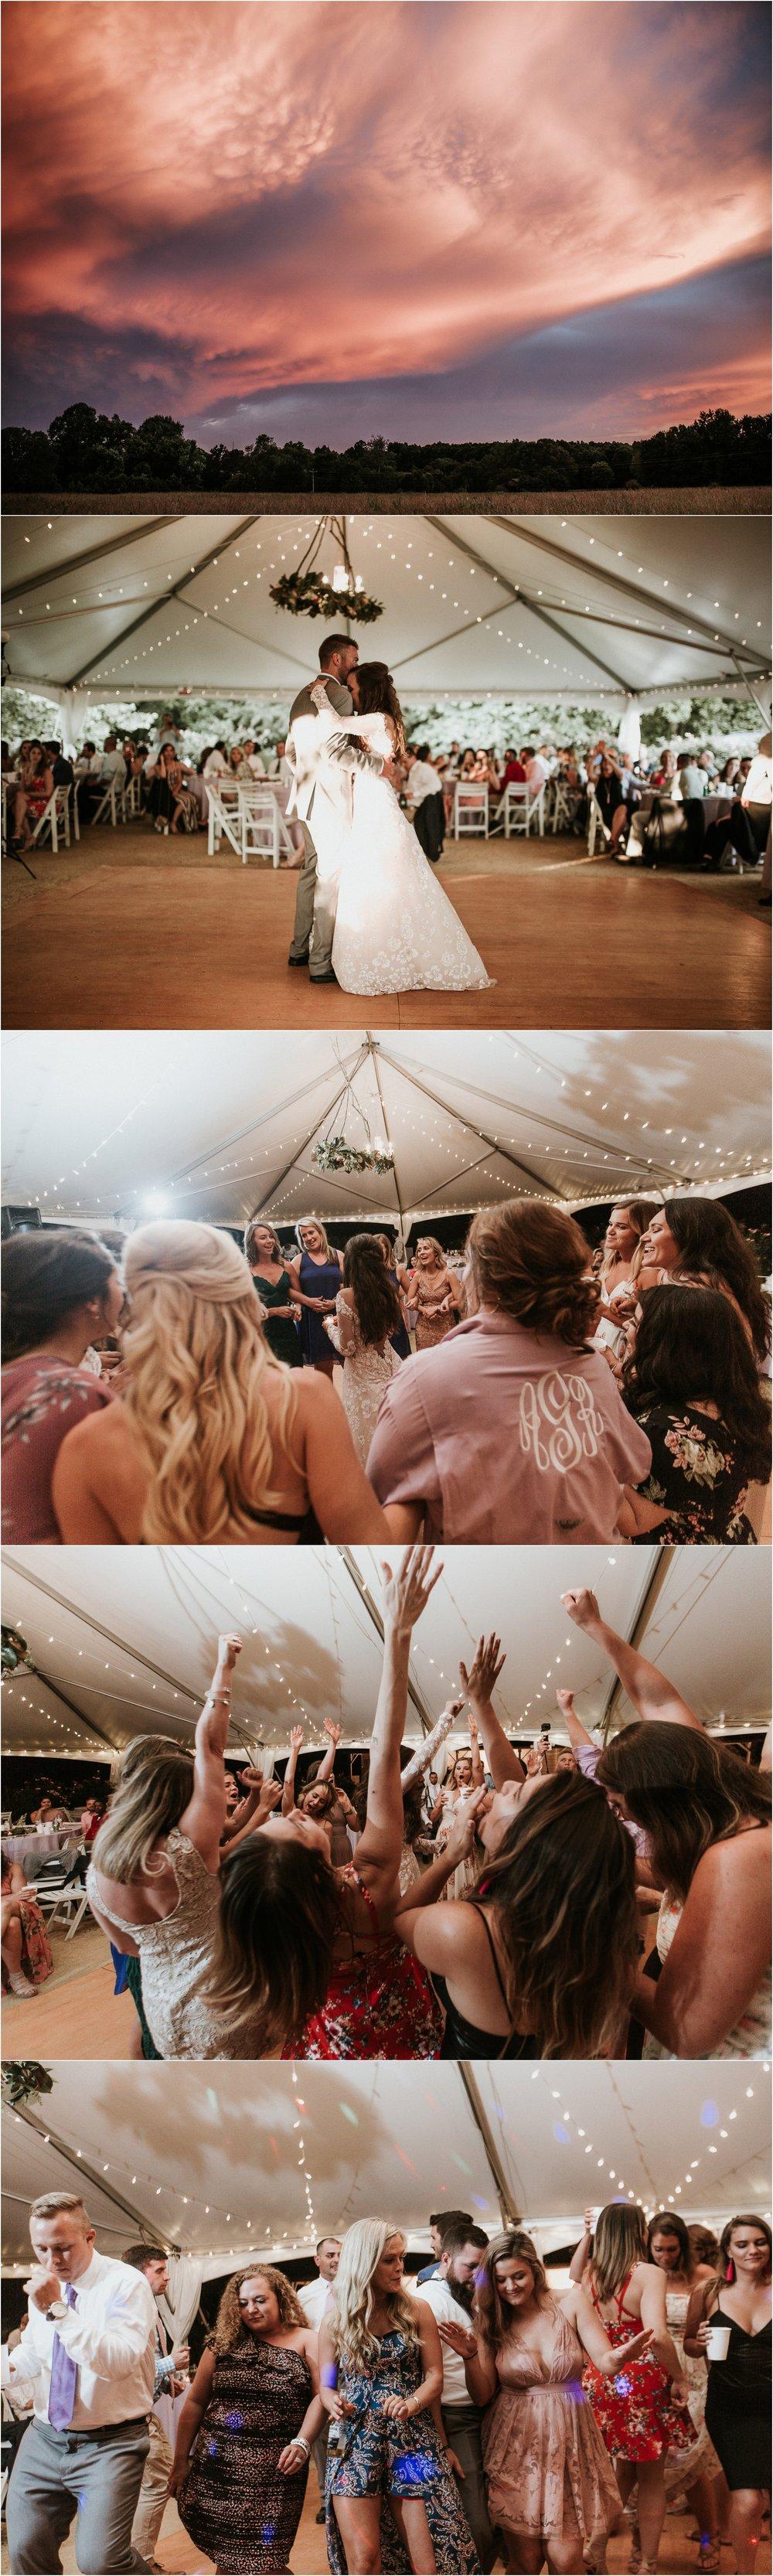 Merry-Hill-Wedding-Mebane-158.jpg